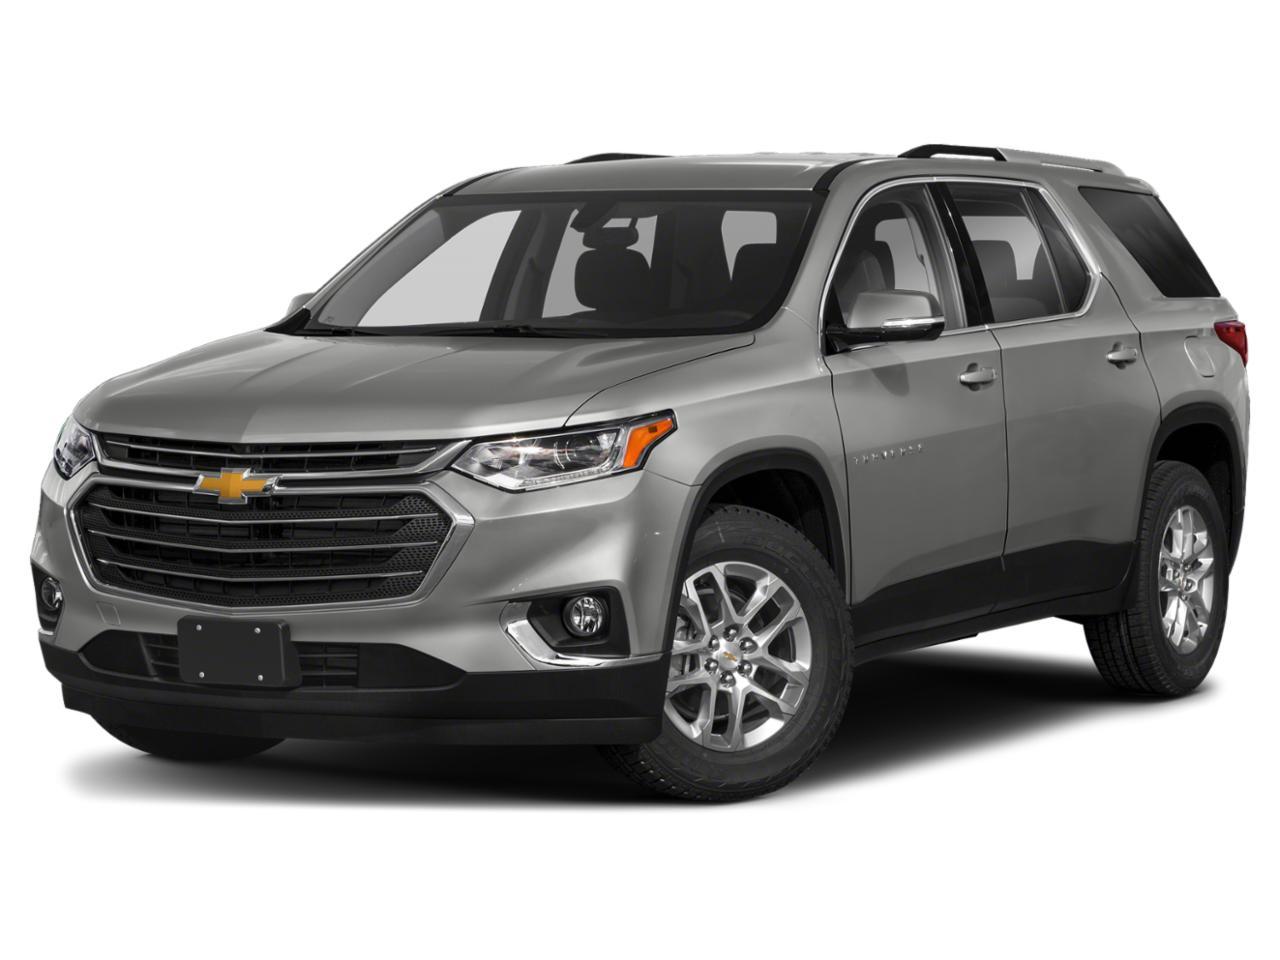 2018 Chevrolet Traverse Vehicle Photo in San Leandro, CA 94577